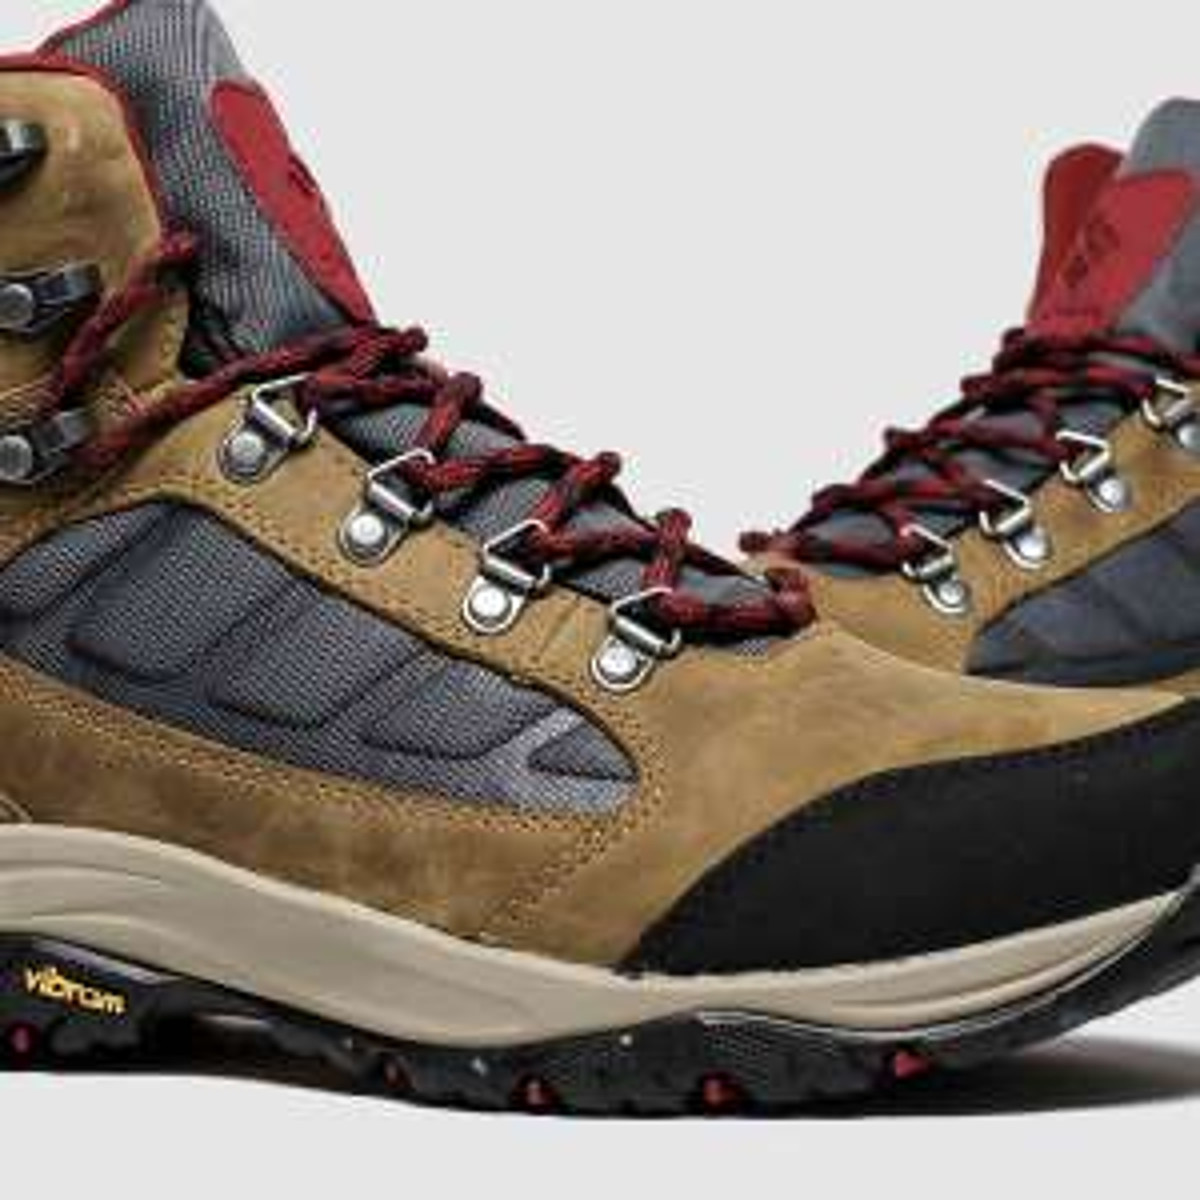 Colombia Outdry Fairbanks boot uk3/4/5/6 £59.99 (+wayfarer £34.99) @ schuh